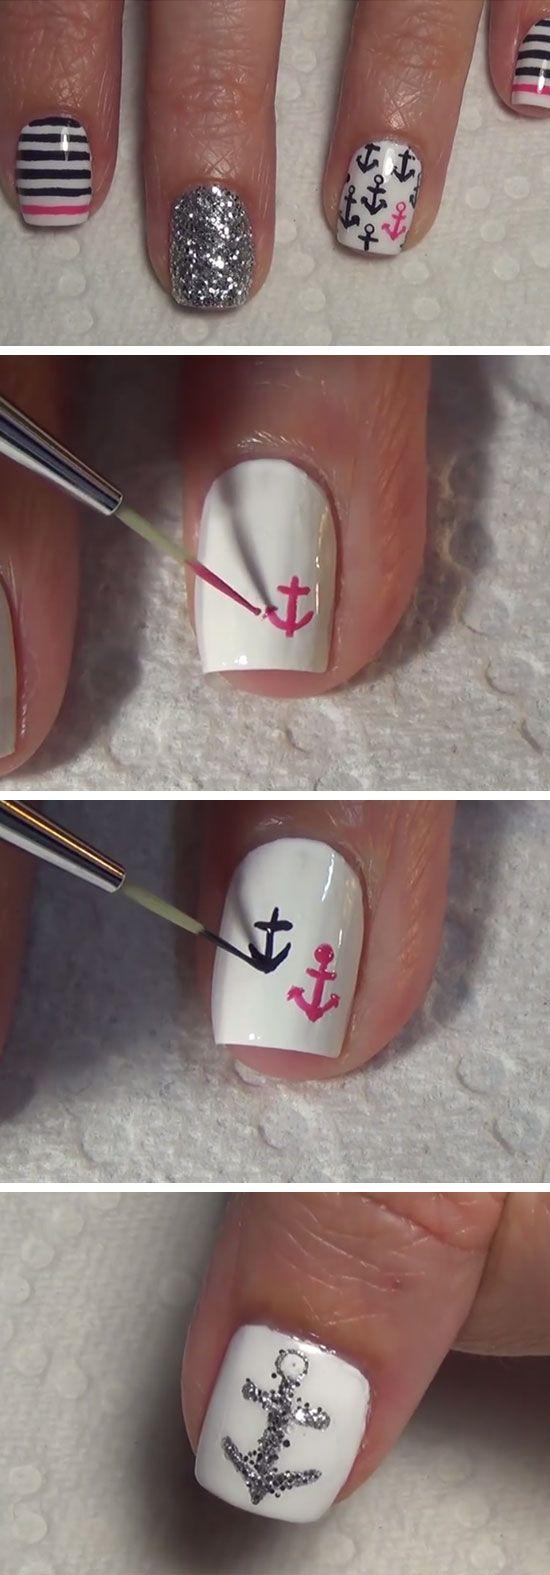 Best 25+ Nail ideas for summer ideas on Pinterest | Summer ...